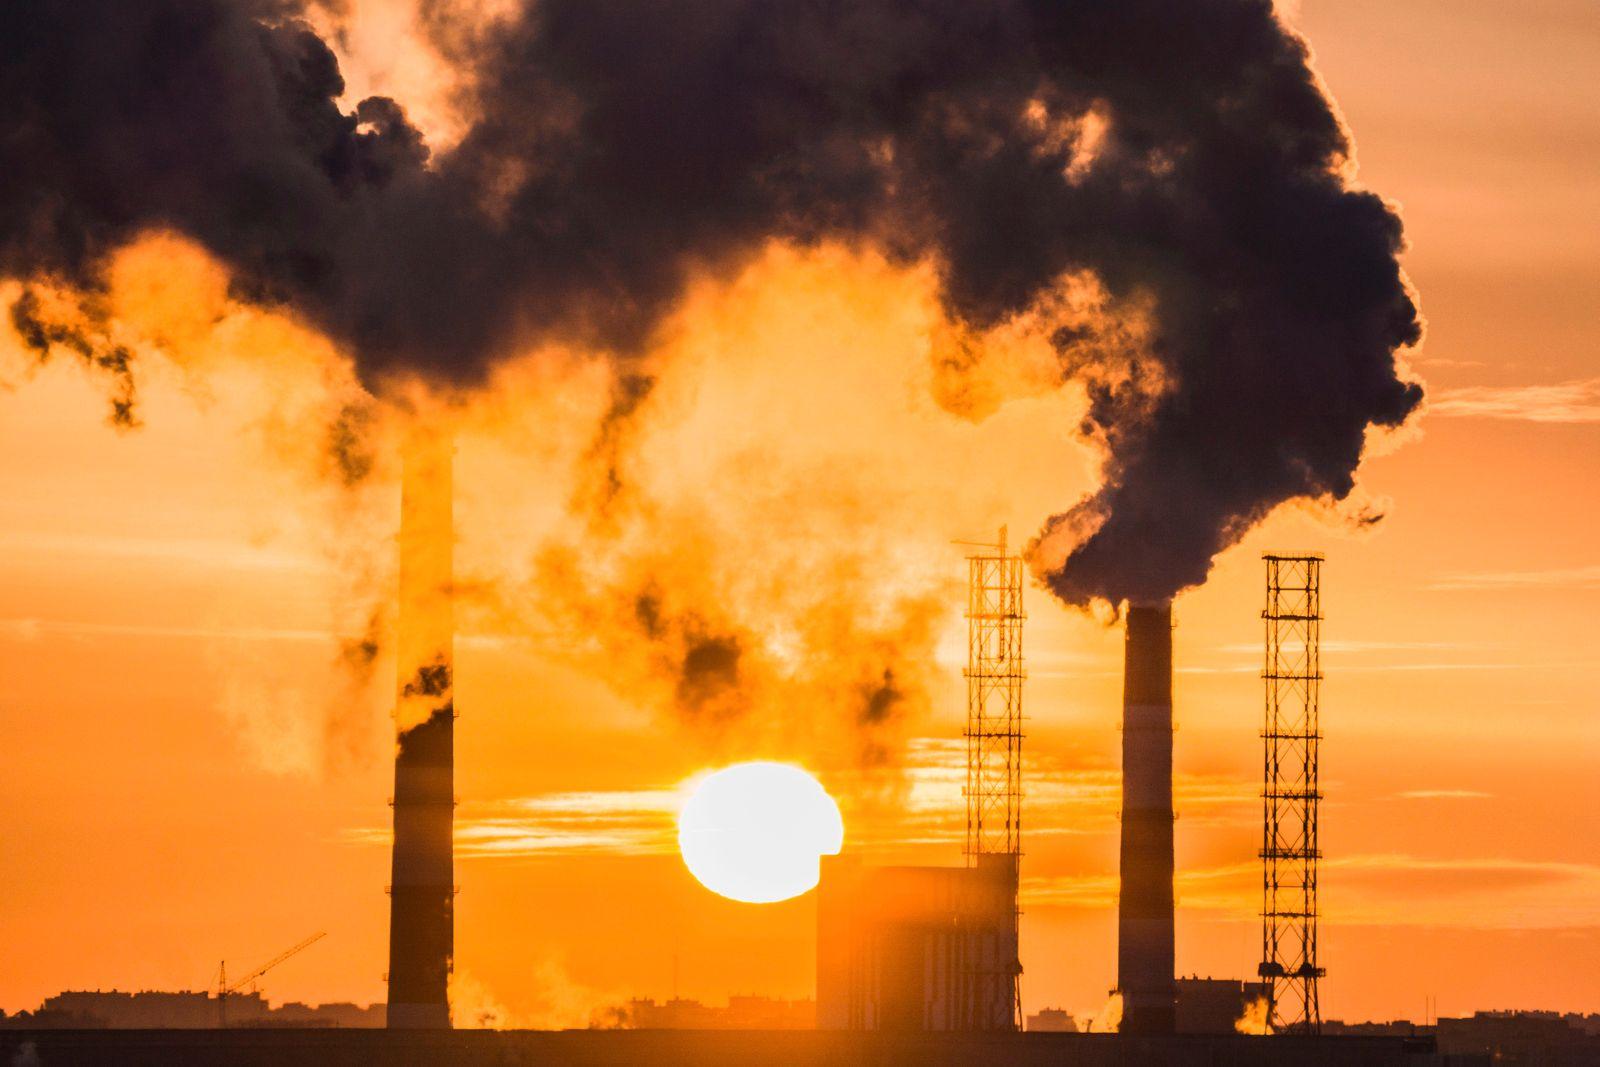 pollution smoke at sunset